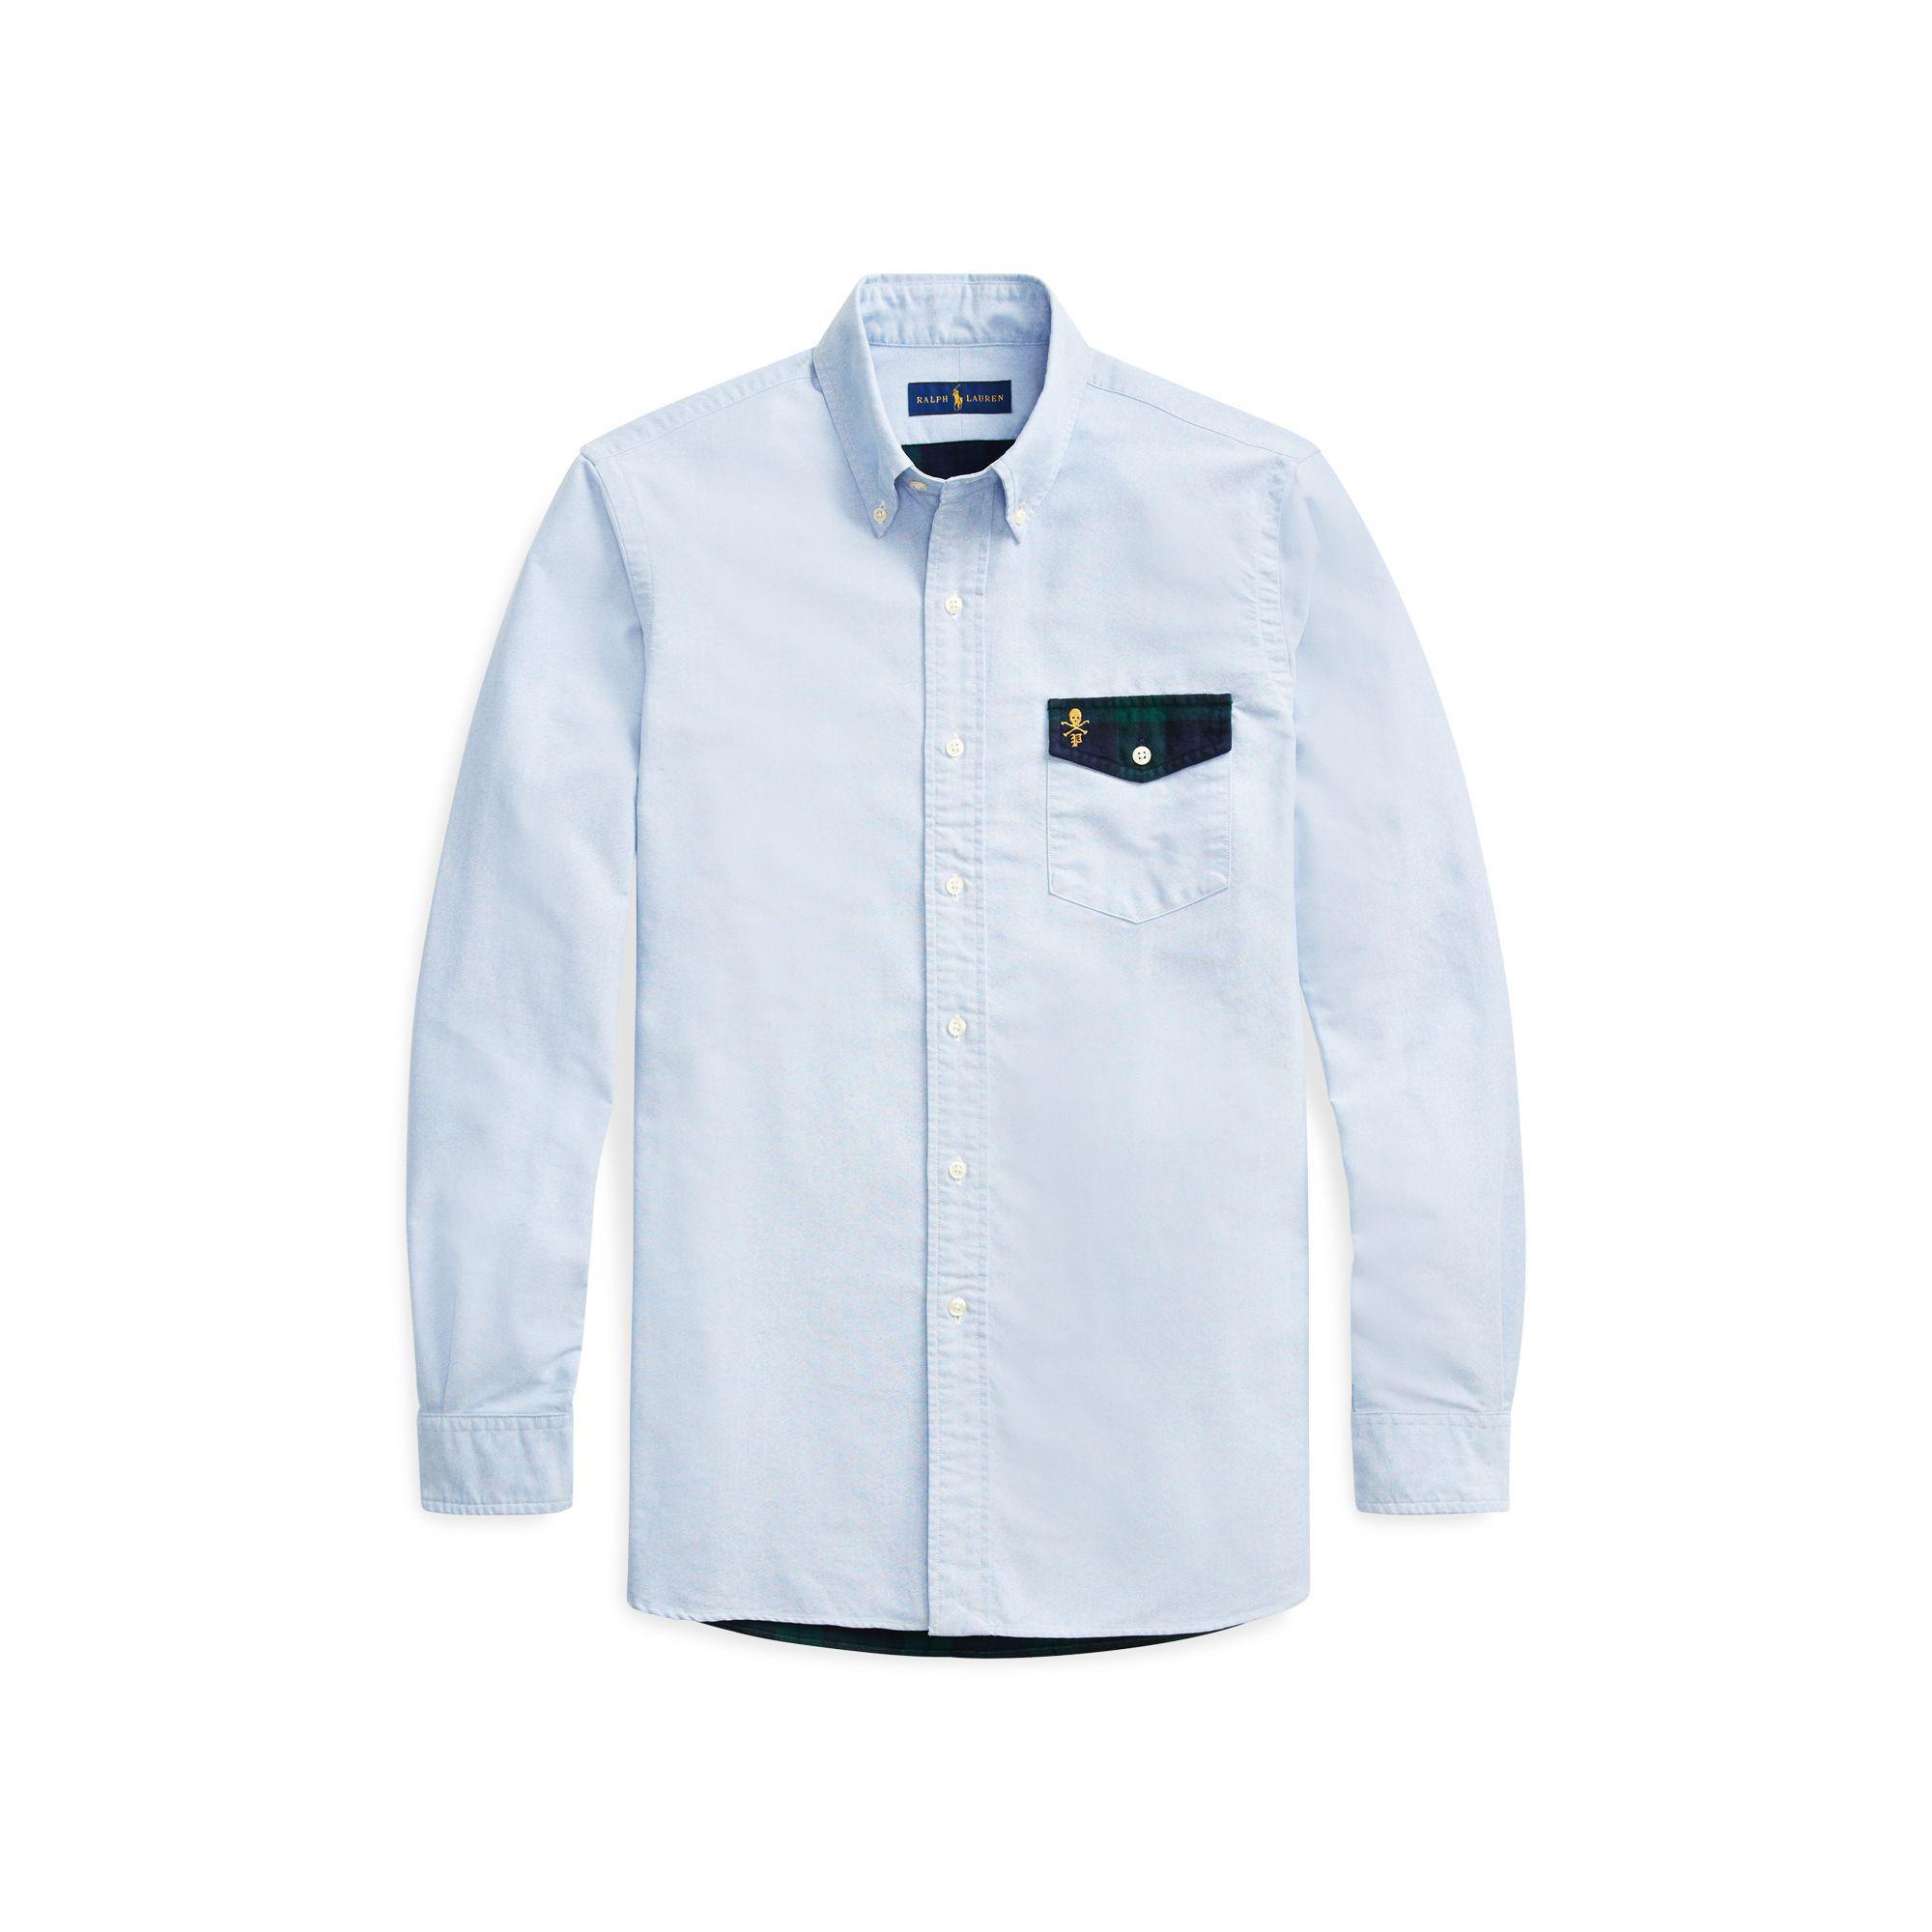 7e1cc79d4 Lyst - Polo Ralph Lauren Classic Fit Oxford Shirt in Blue for Men